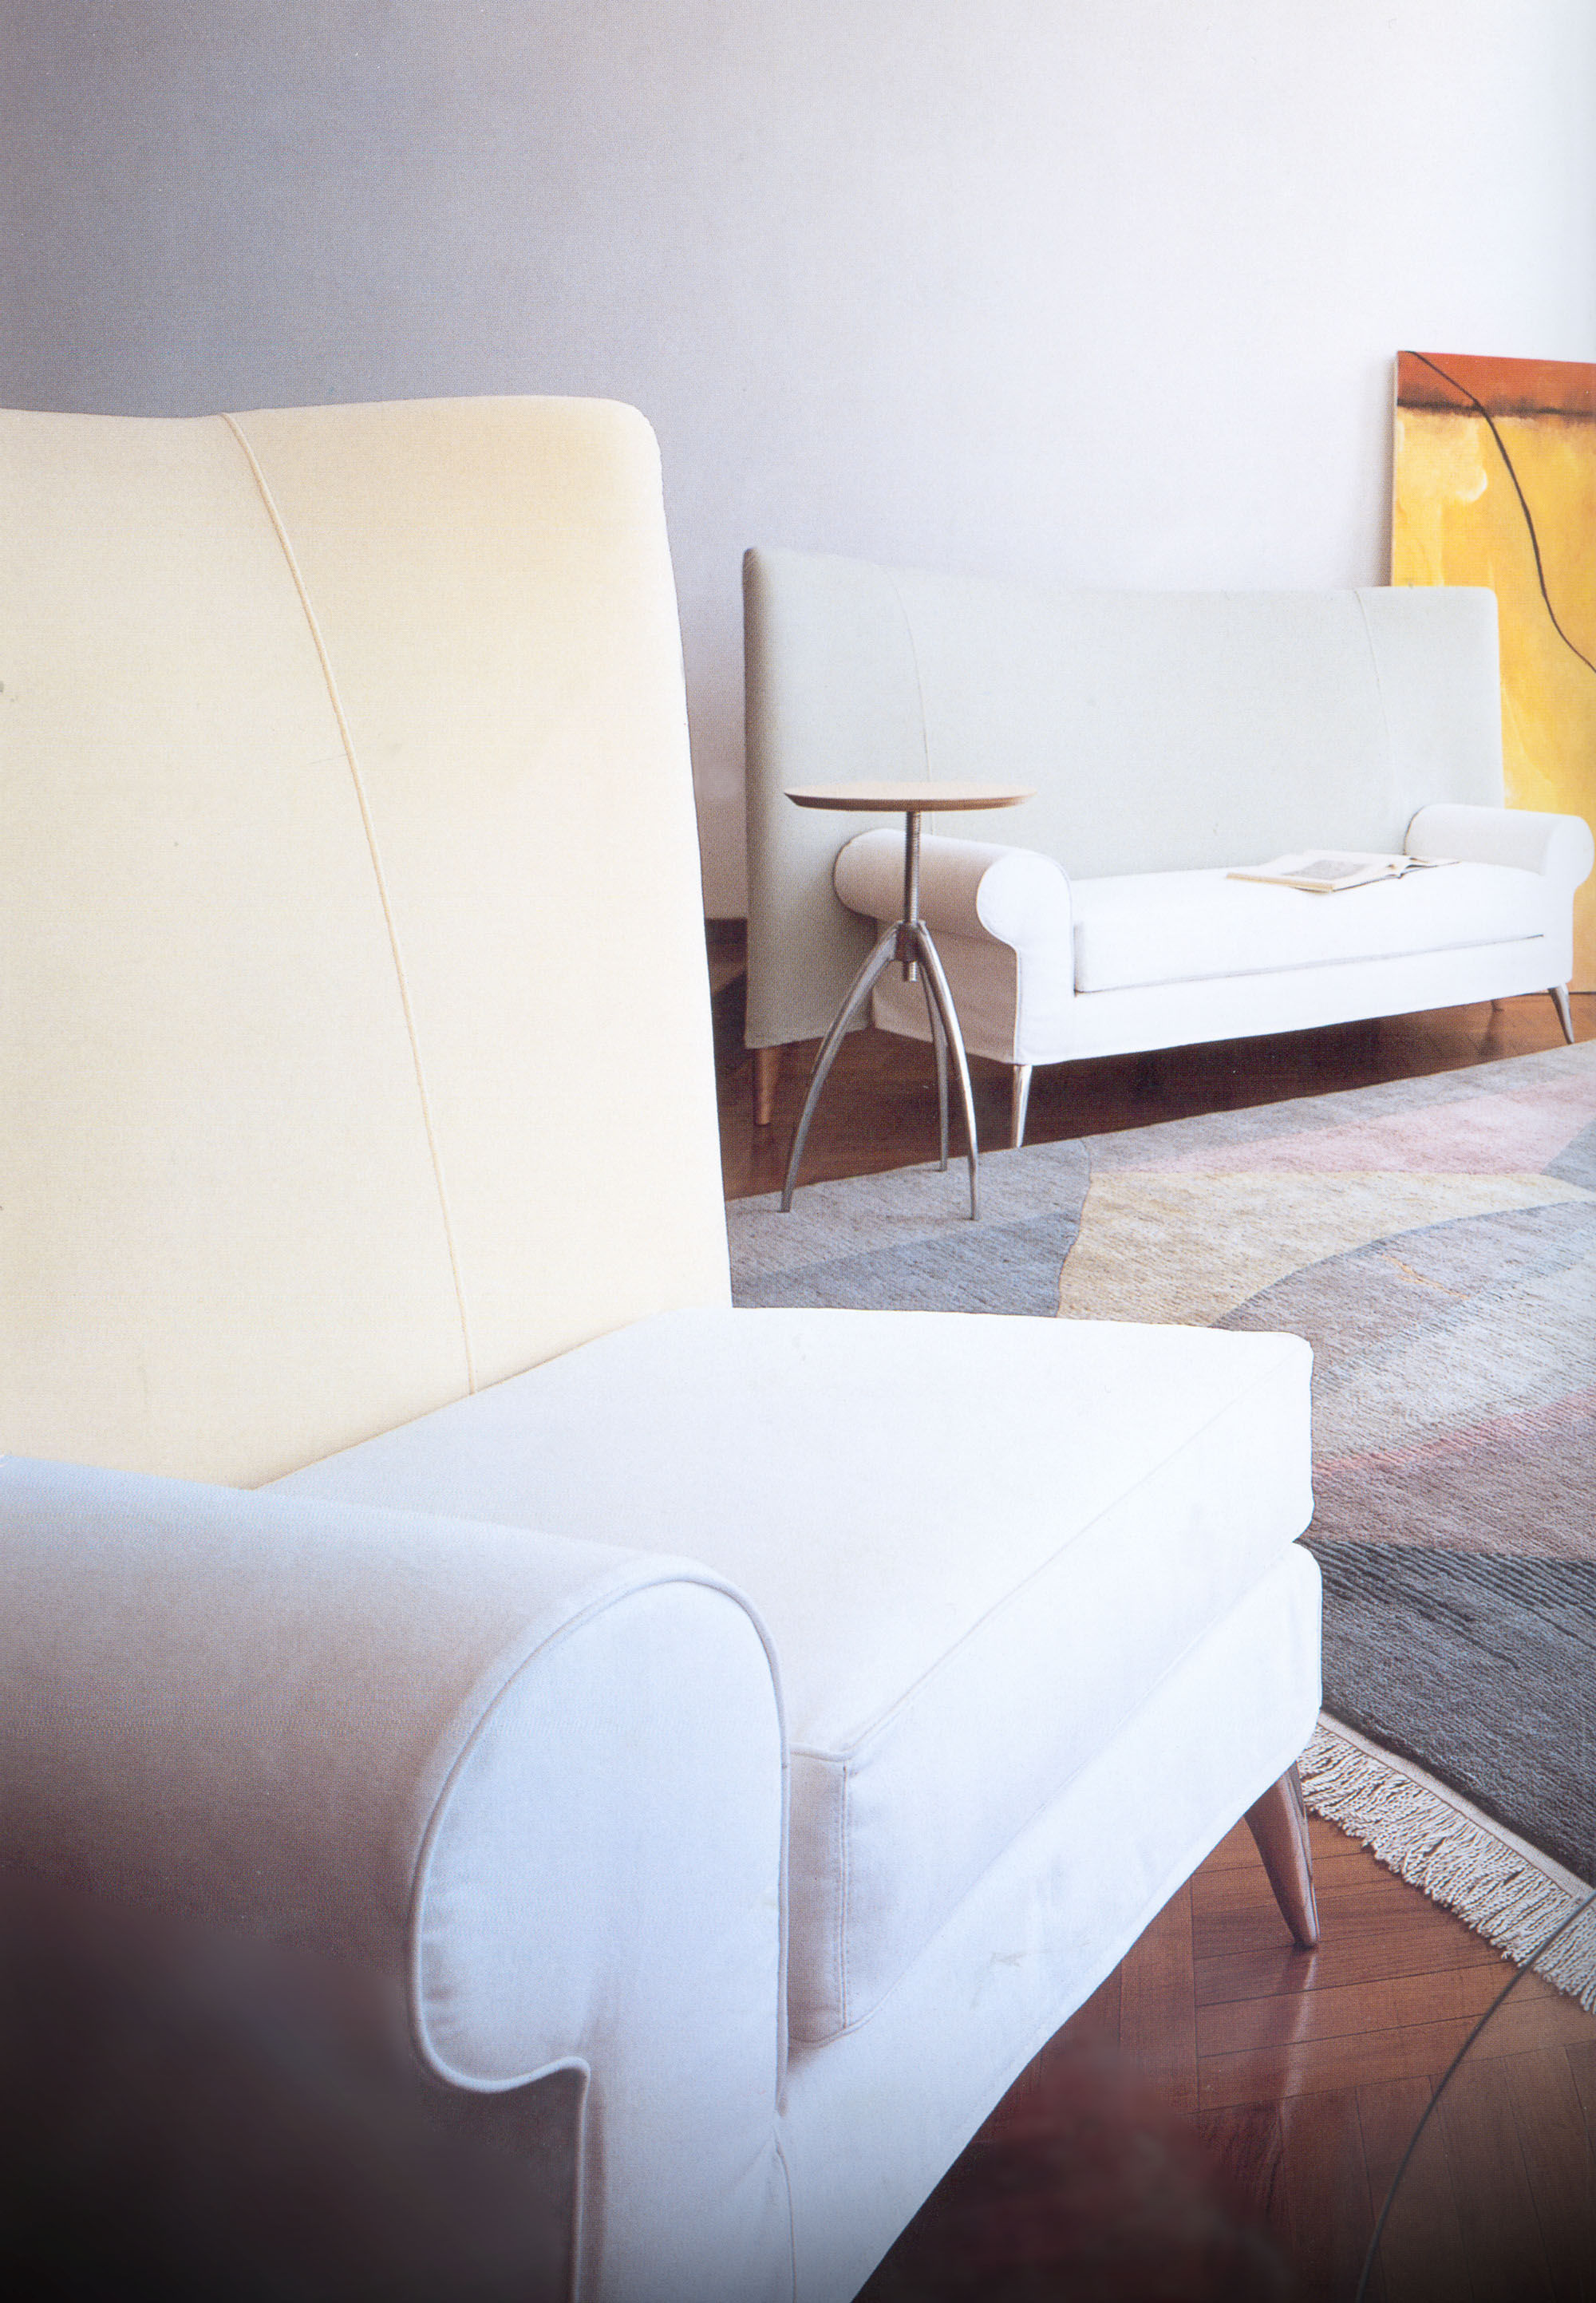 canap droit royalton l 207 cm beige driade. Black Bedroom Furniture Sets. Home Design Ideas